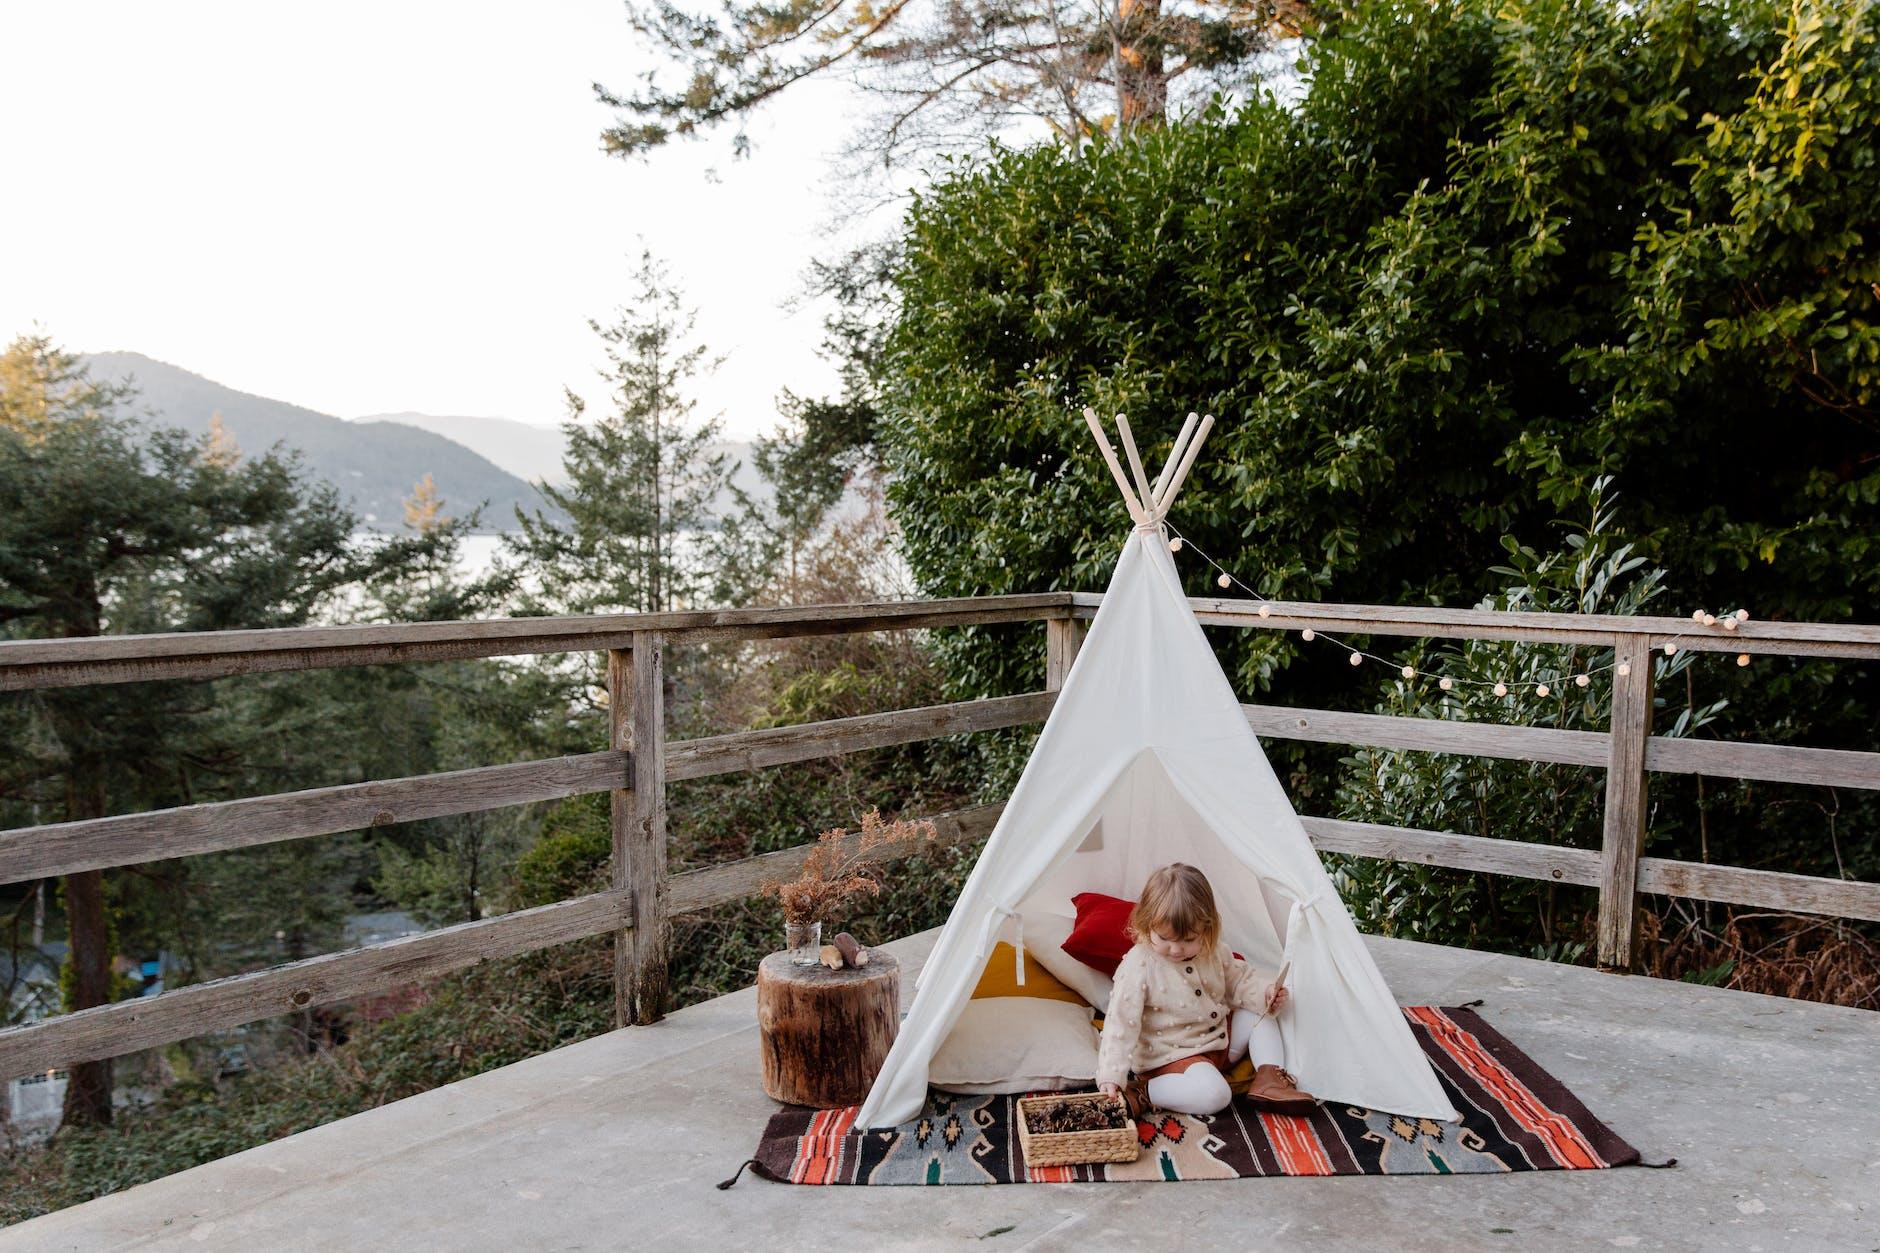 Backyard camping party ideas, thelashop